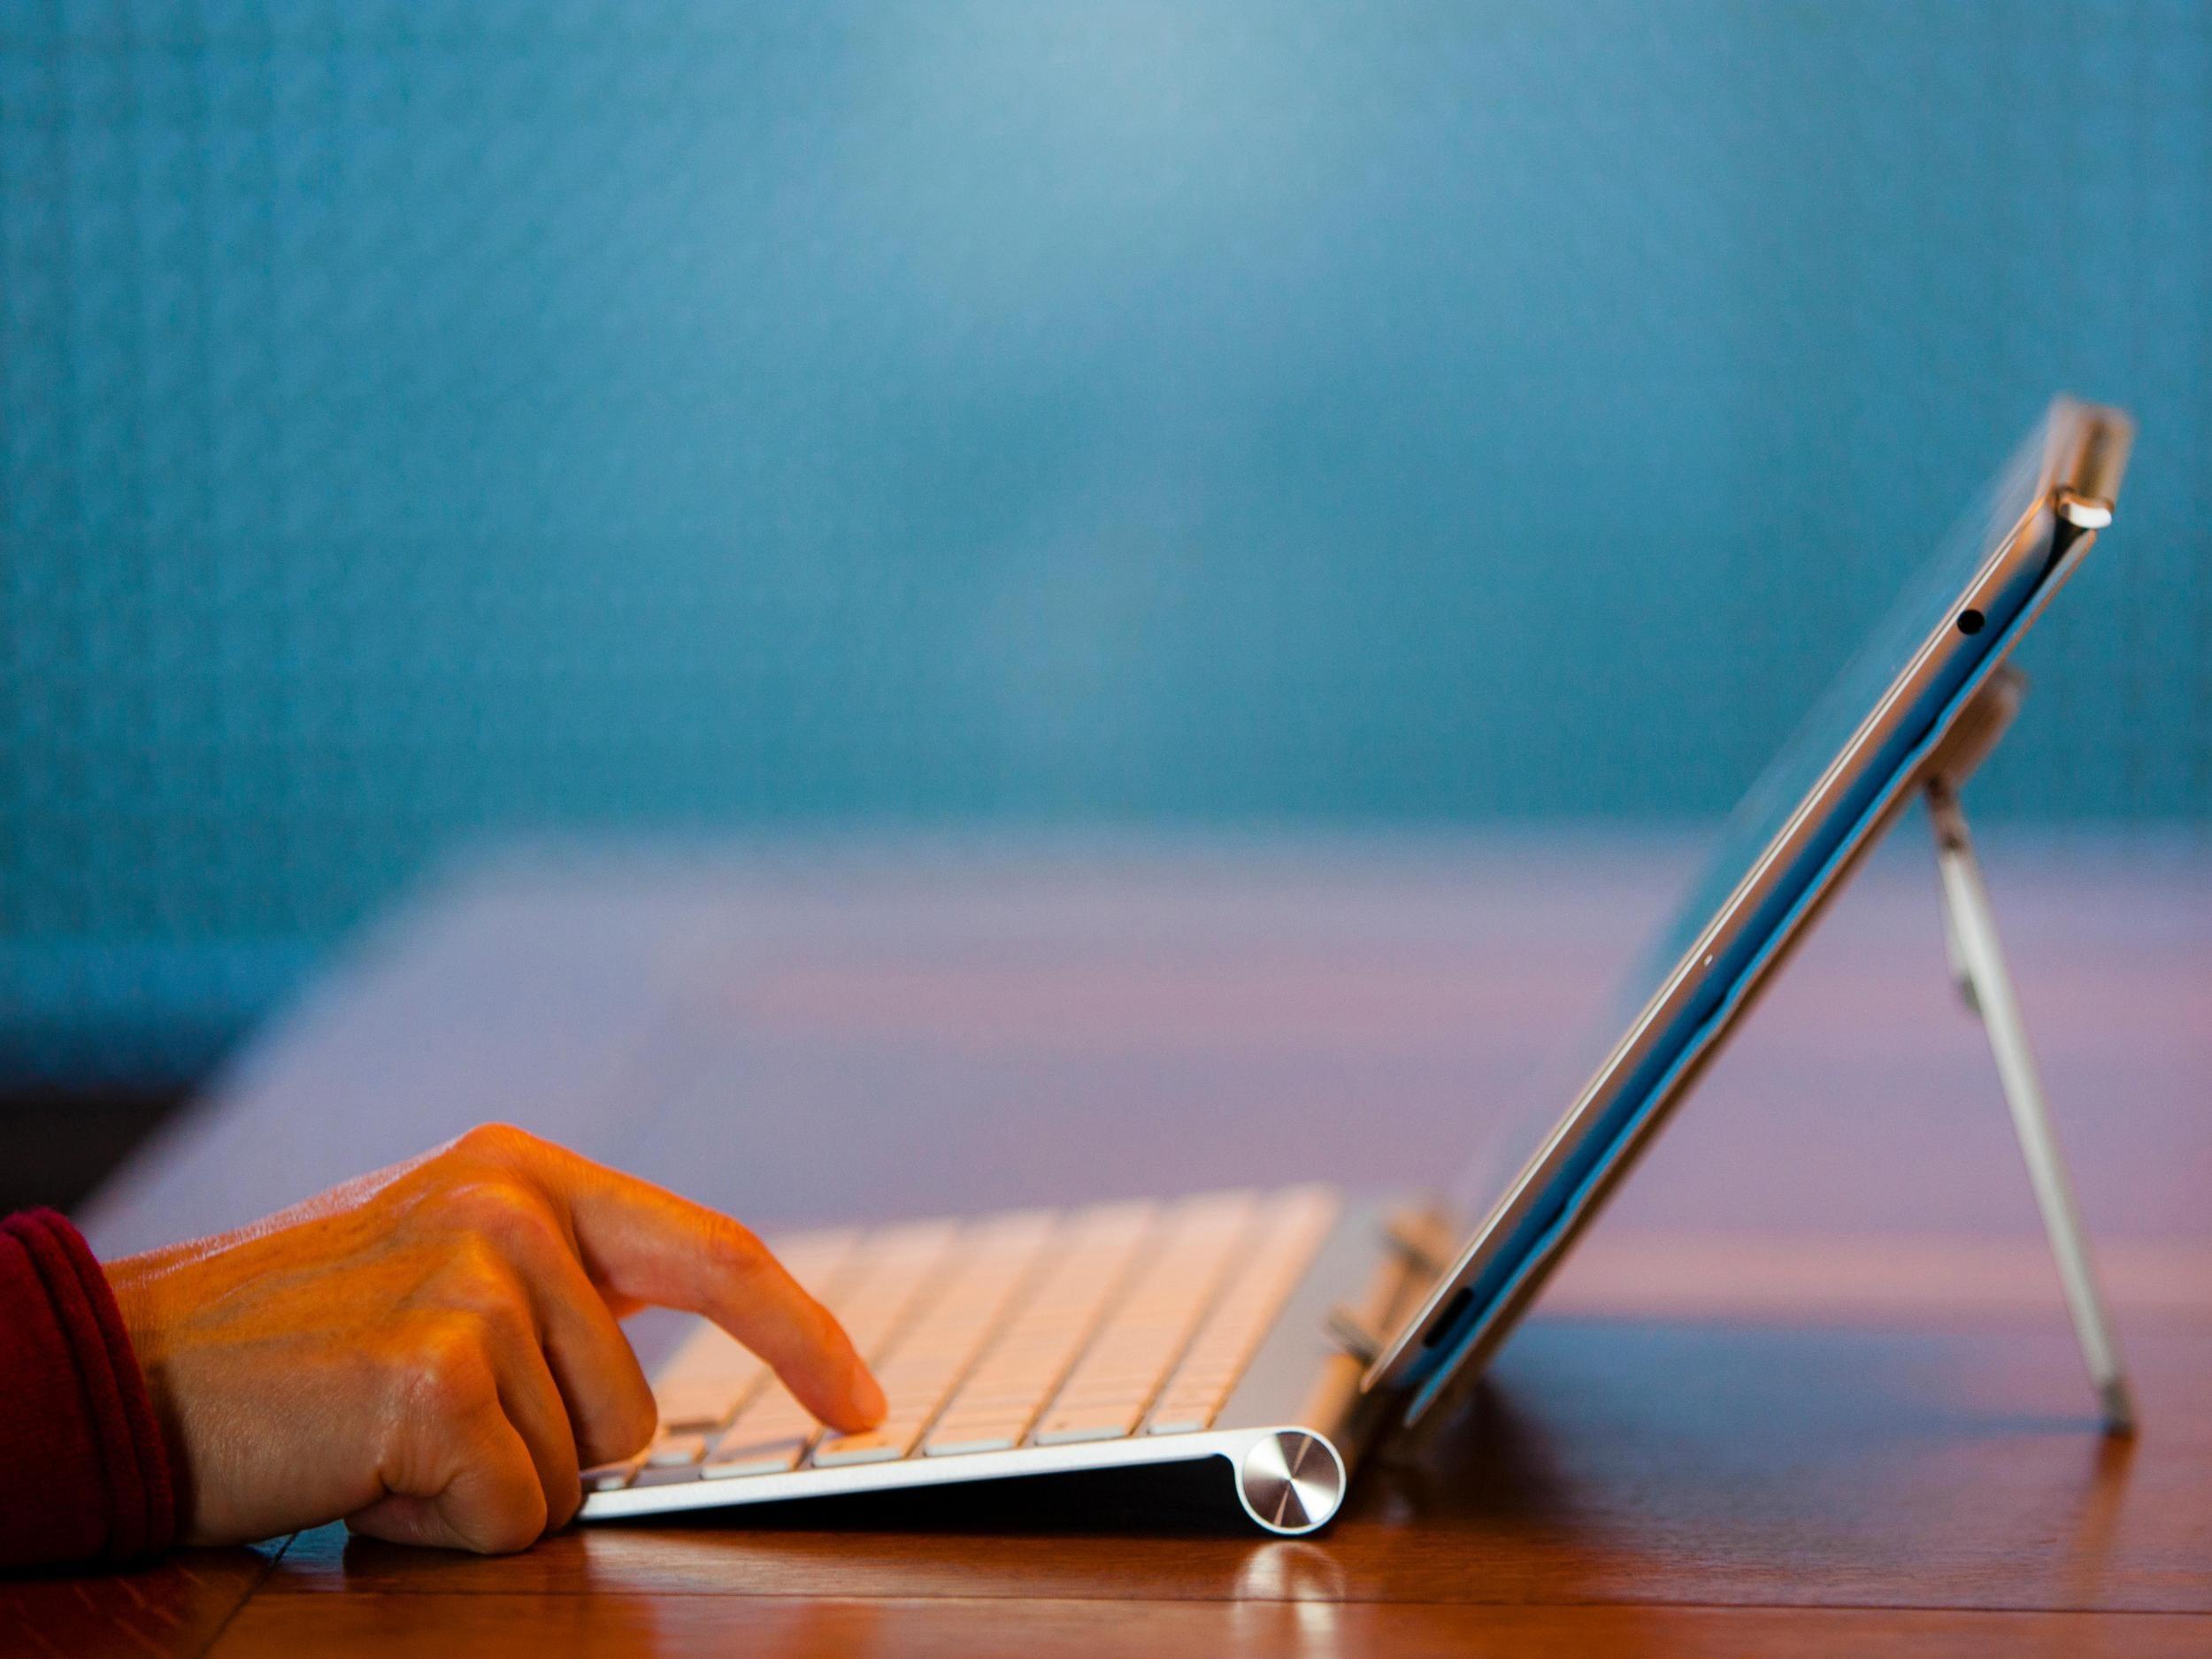 Best Two-in-one Laptops